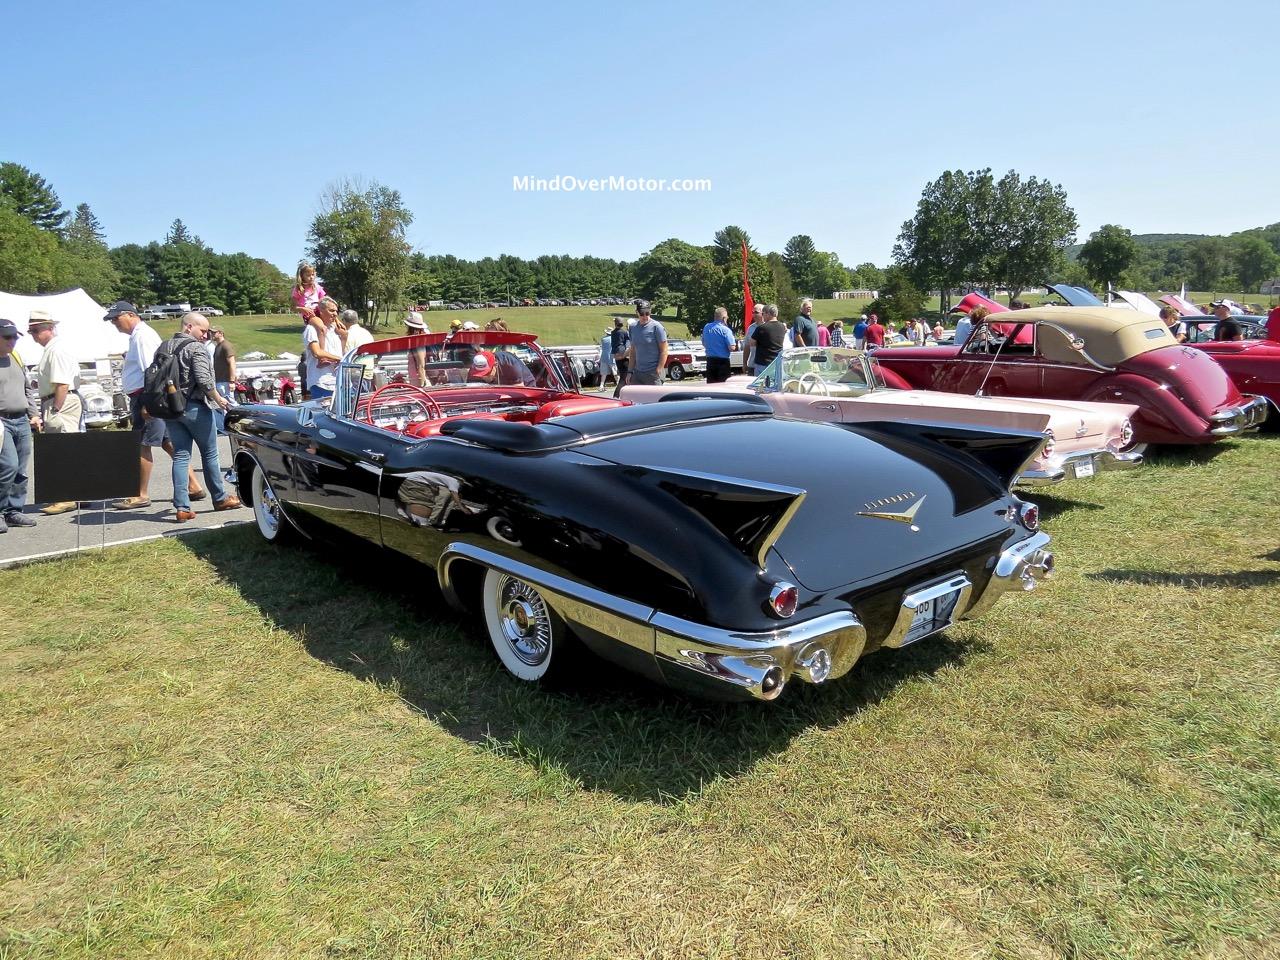 1957 Cadillac Eldorado Biarritz Rear Angle